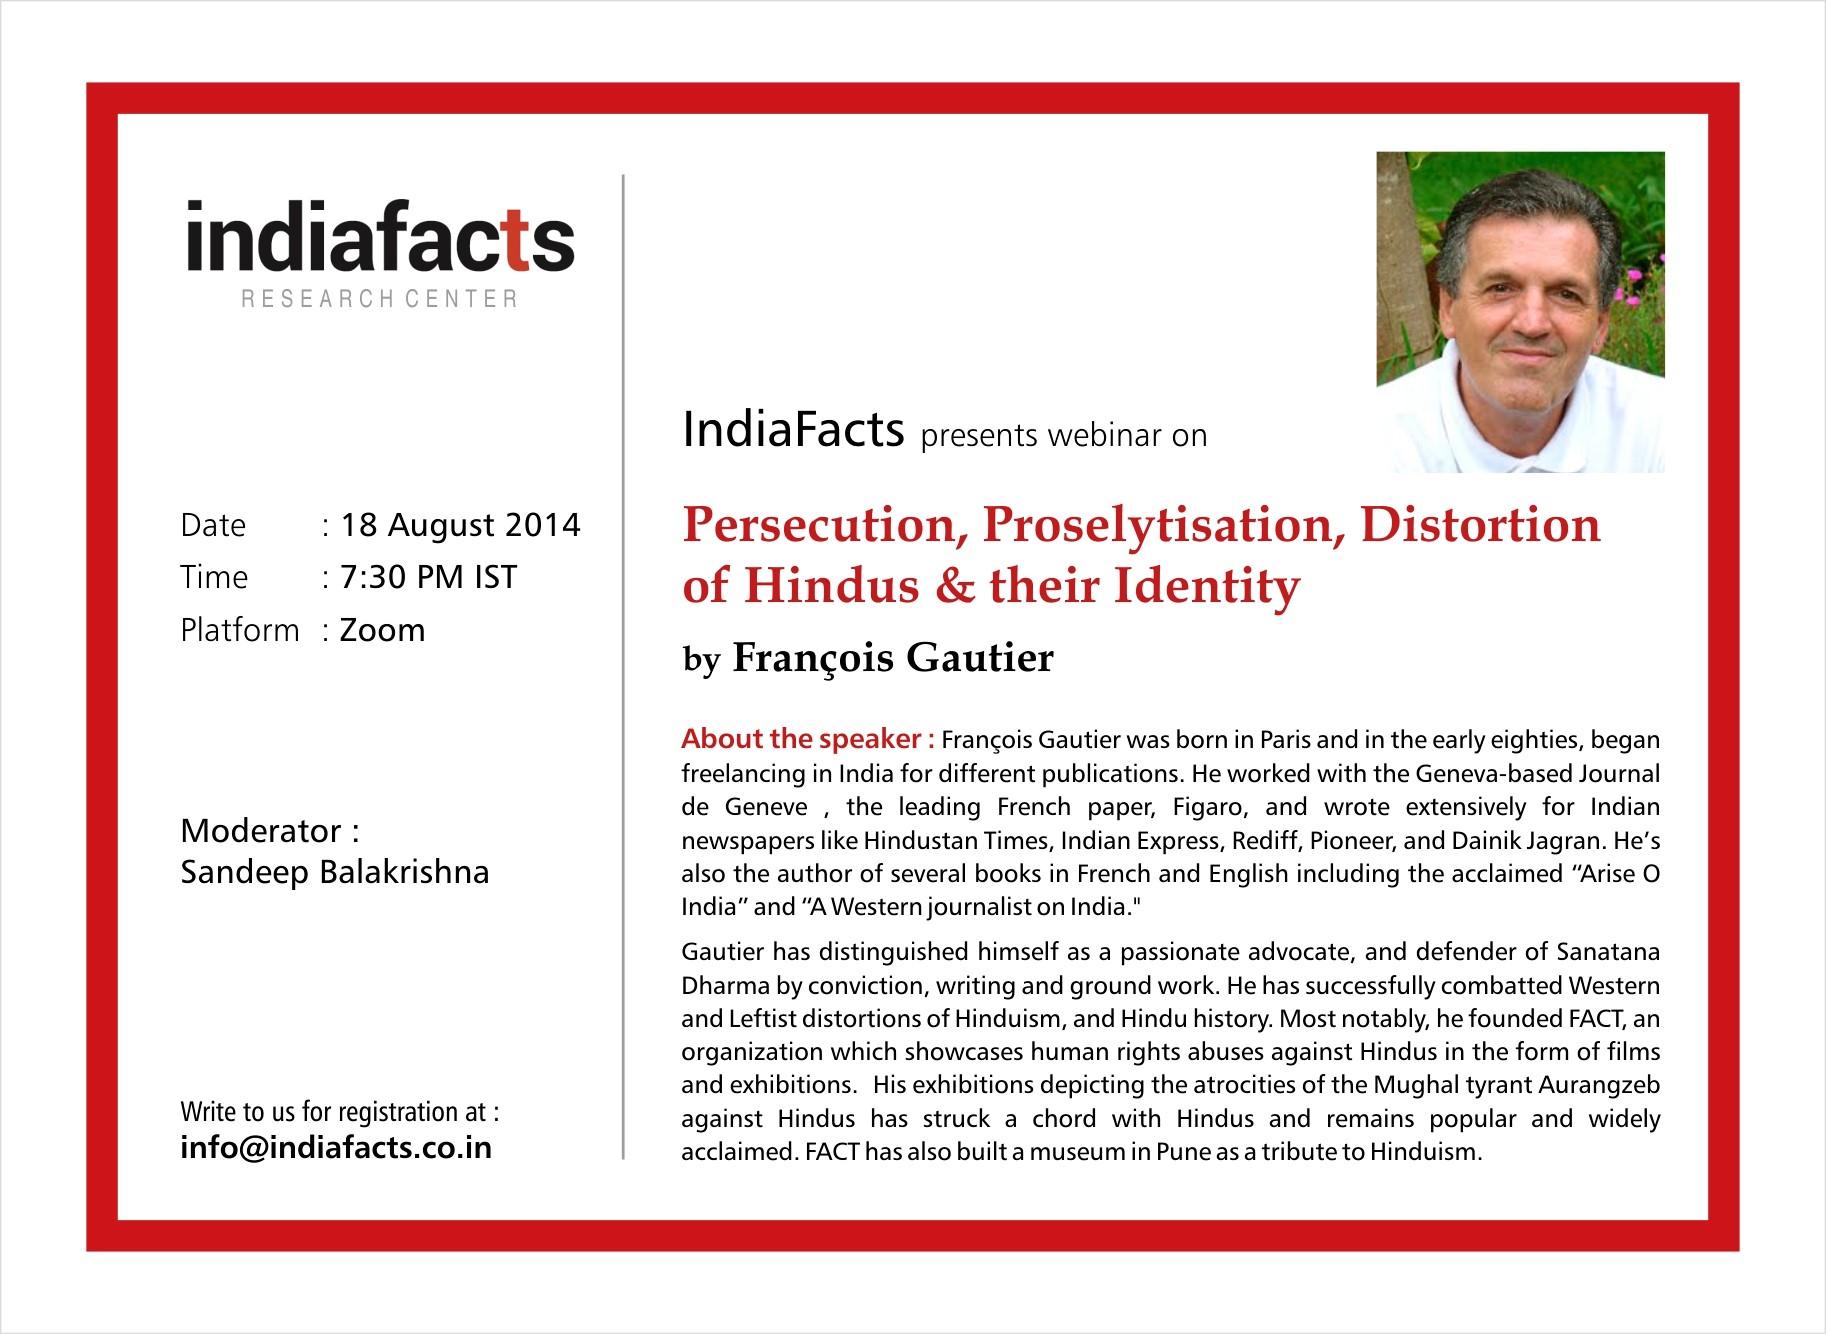 Webinar: Persecution, Proselytisation & Distortion of Hindus & their Identity